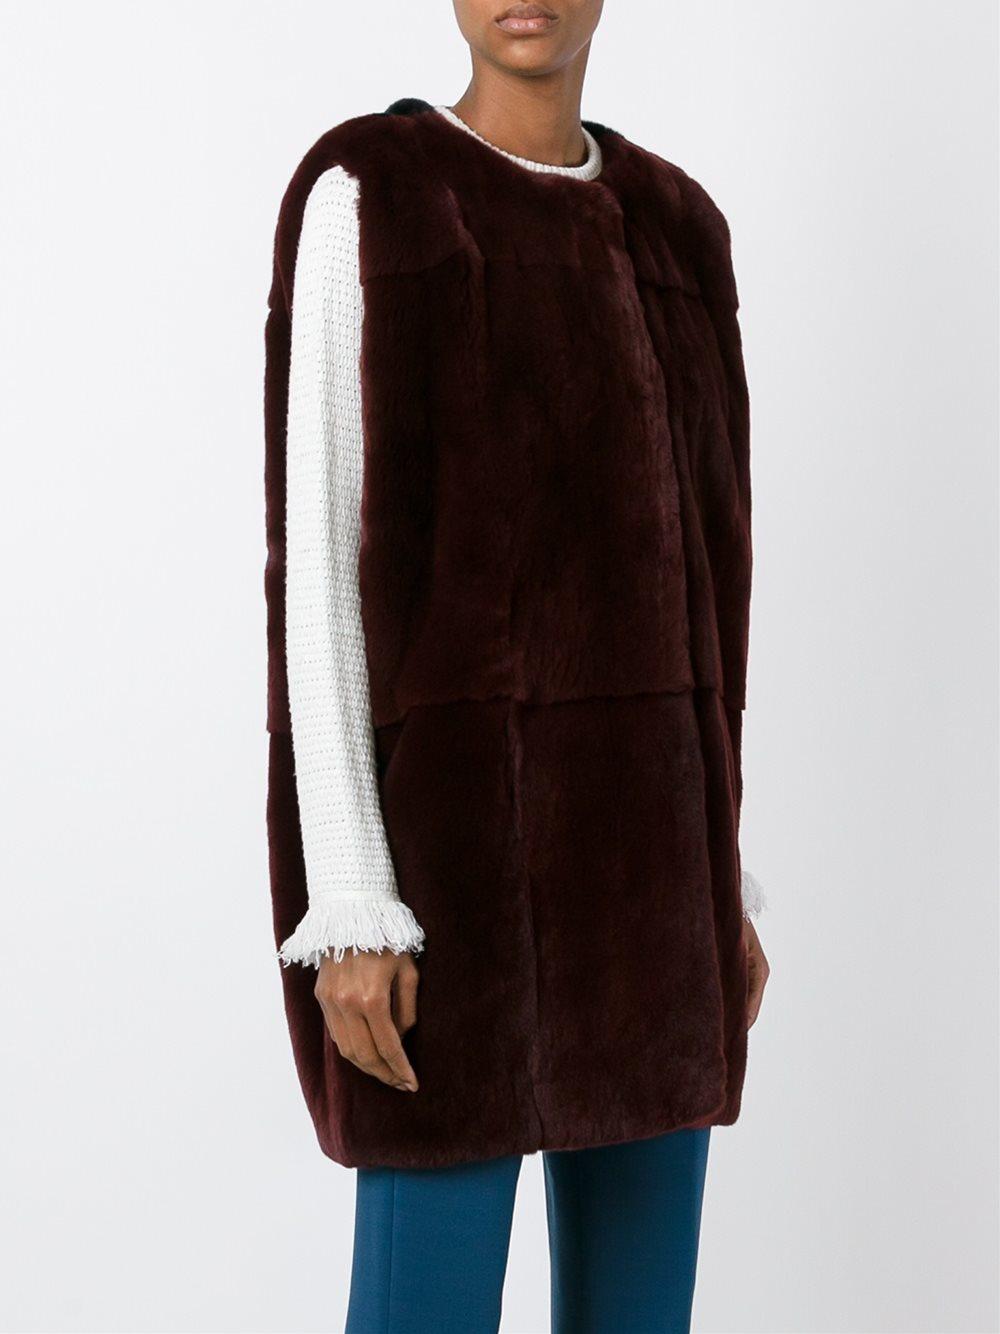 Marni Rabbit Fur Gilet In Brown Lyst